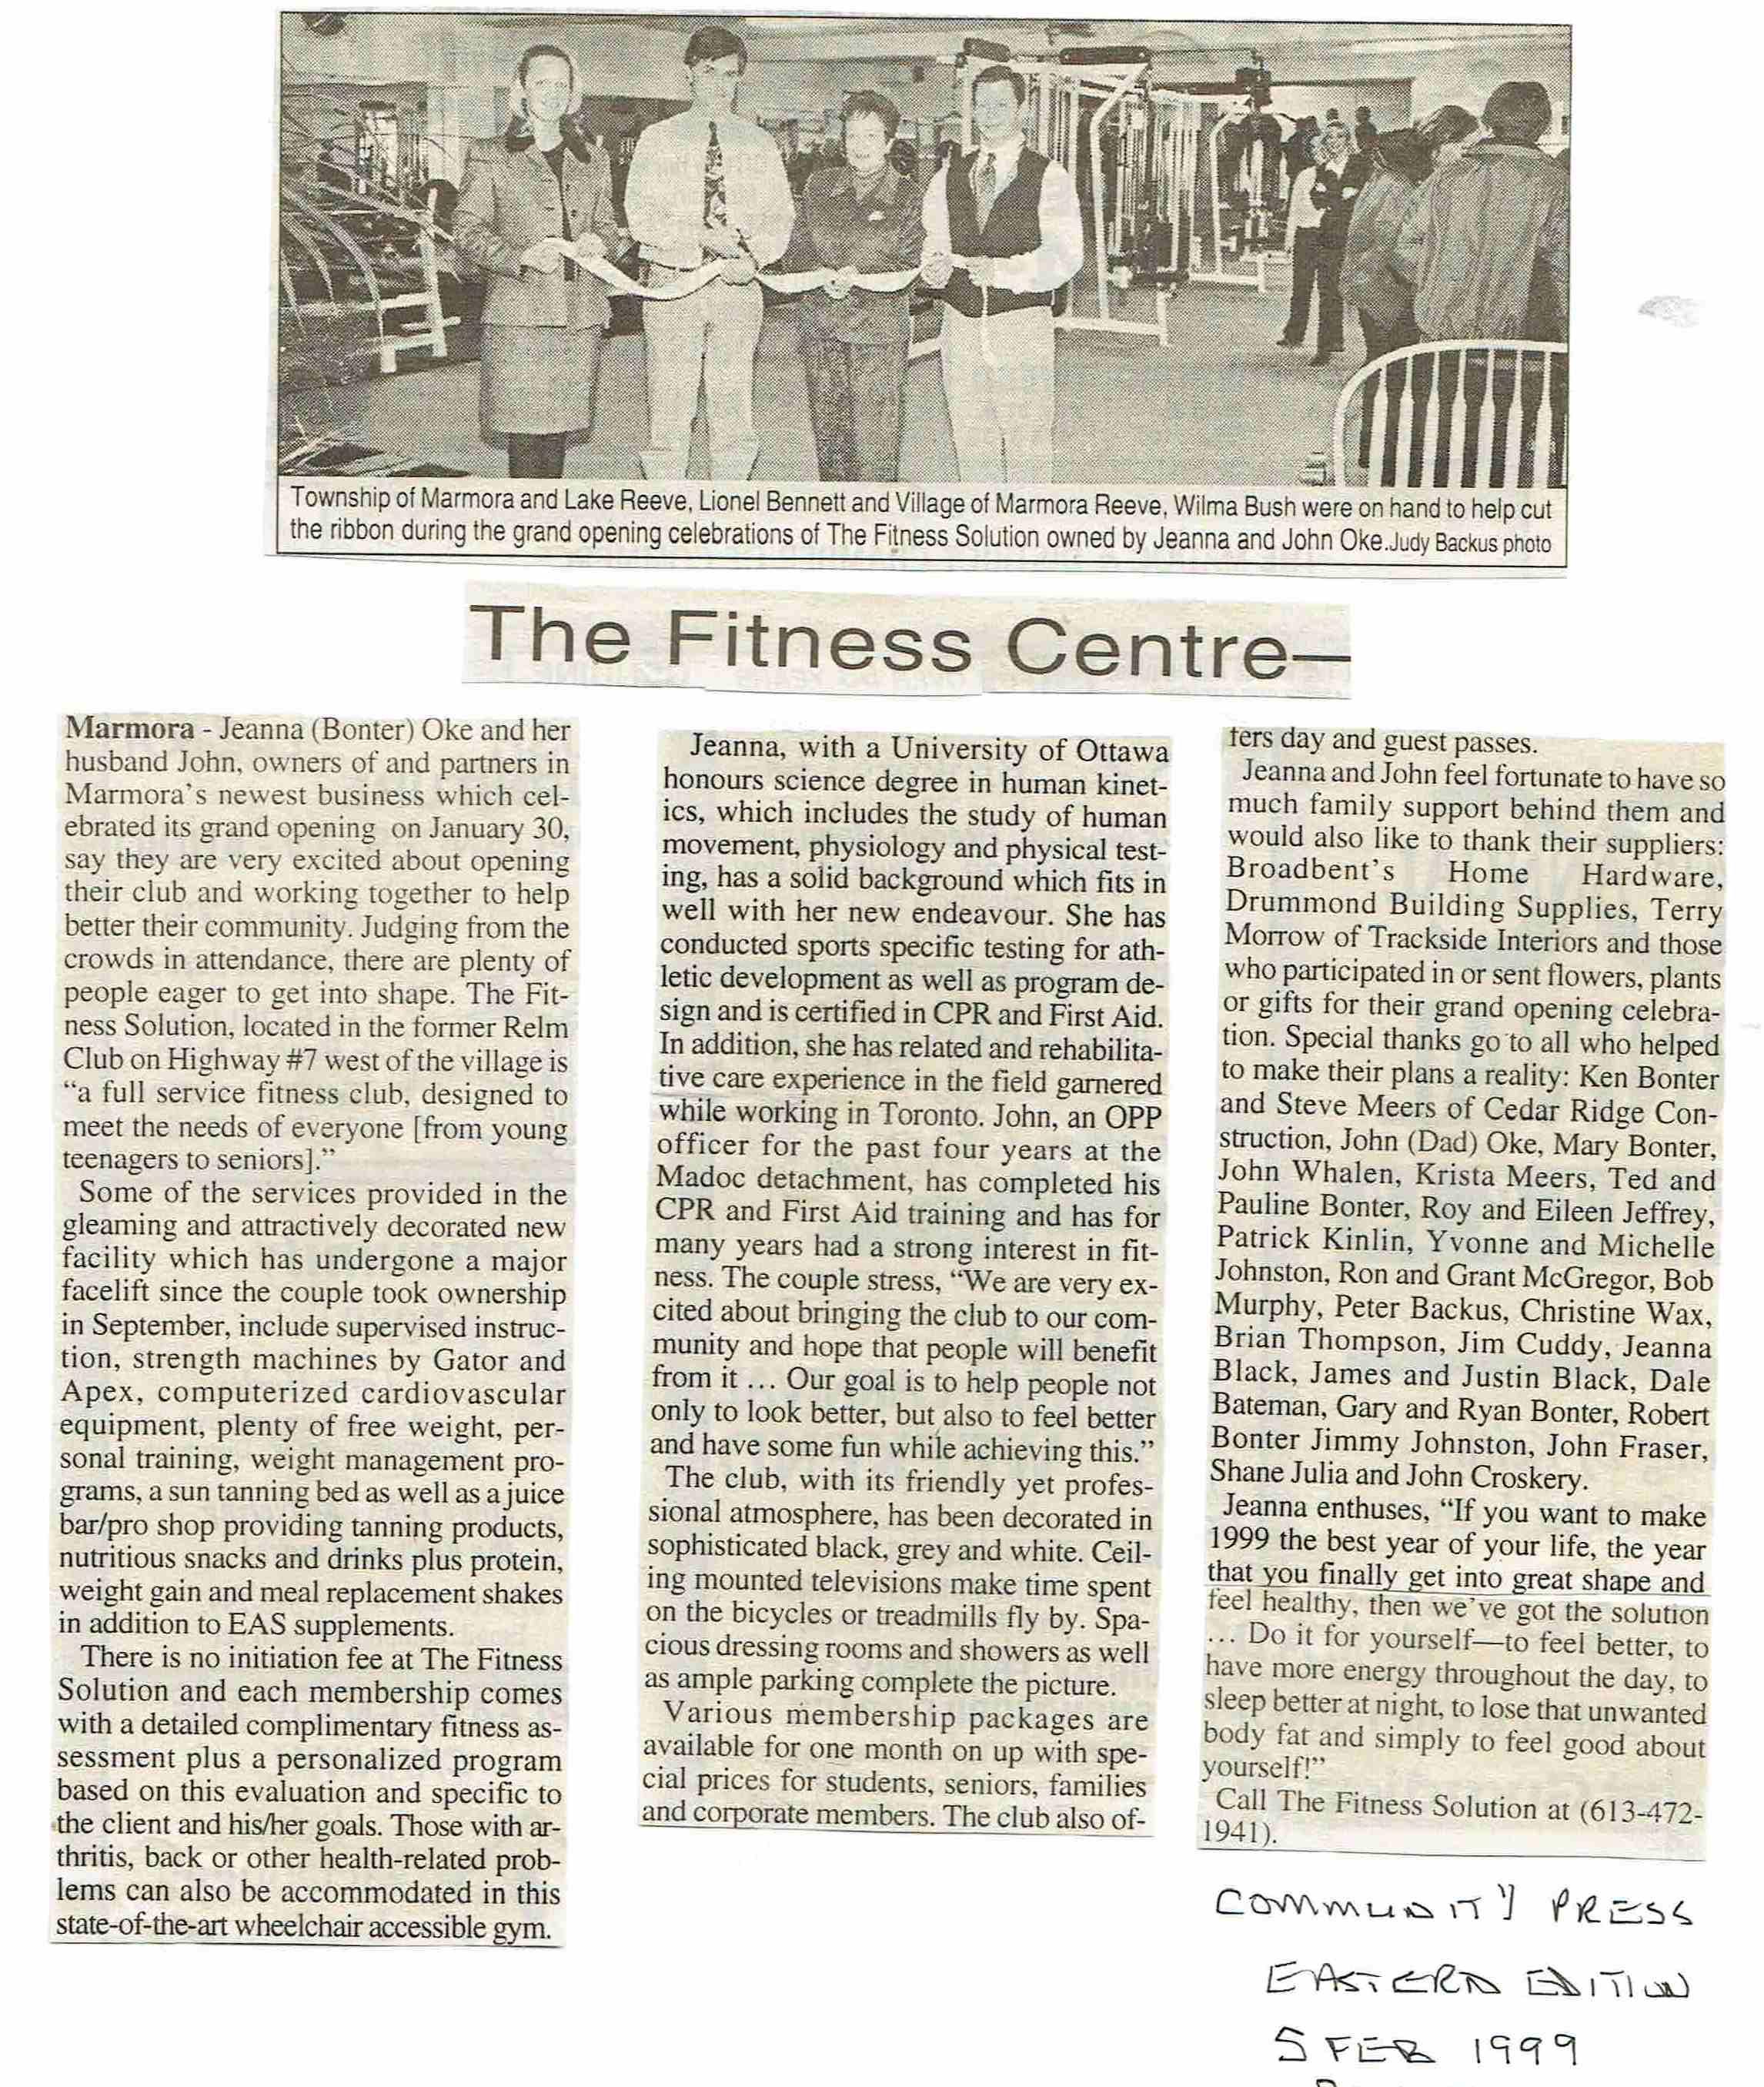 1999 Oke Fitness Centre Relm Club.JPG